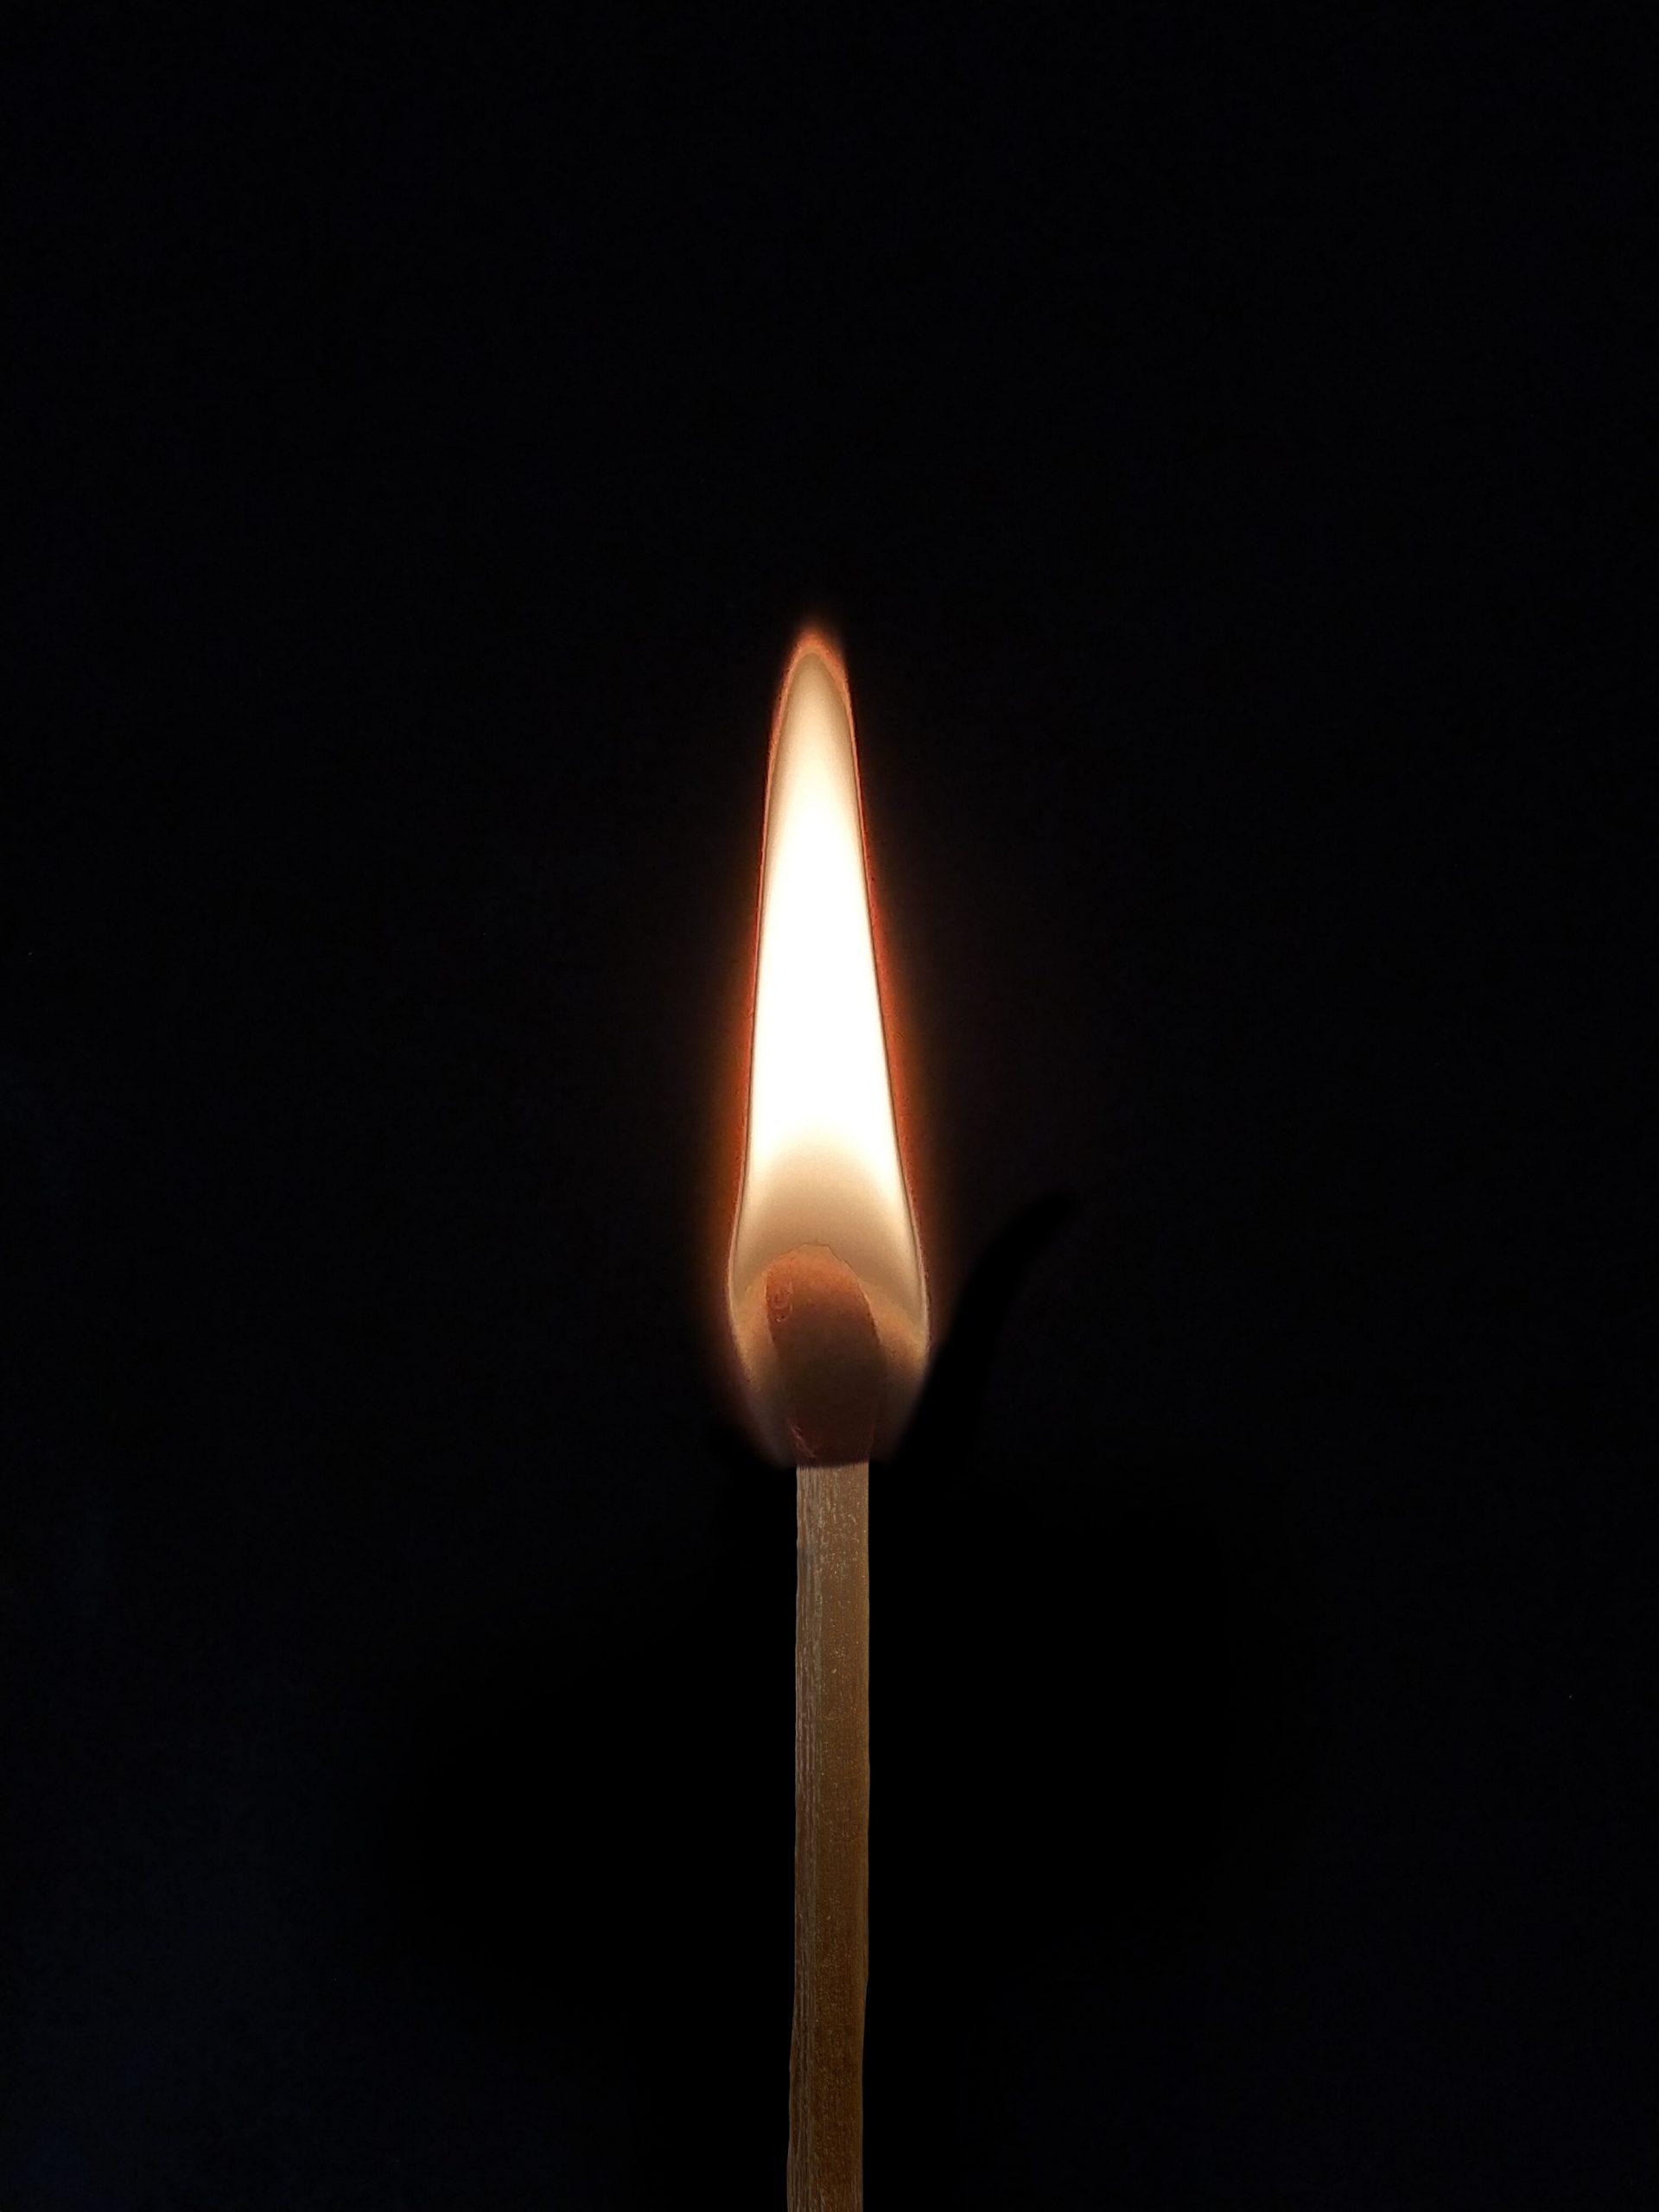 Burning match stick